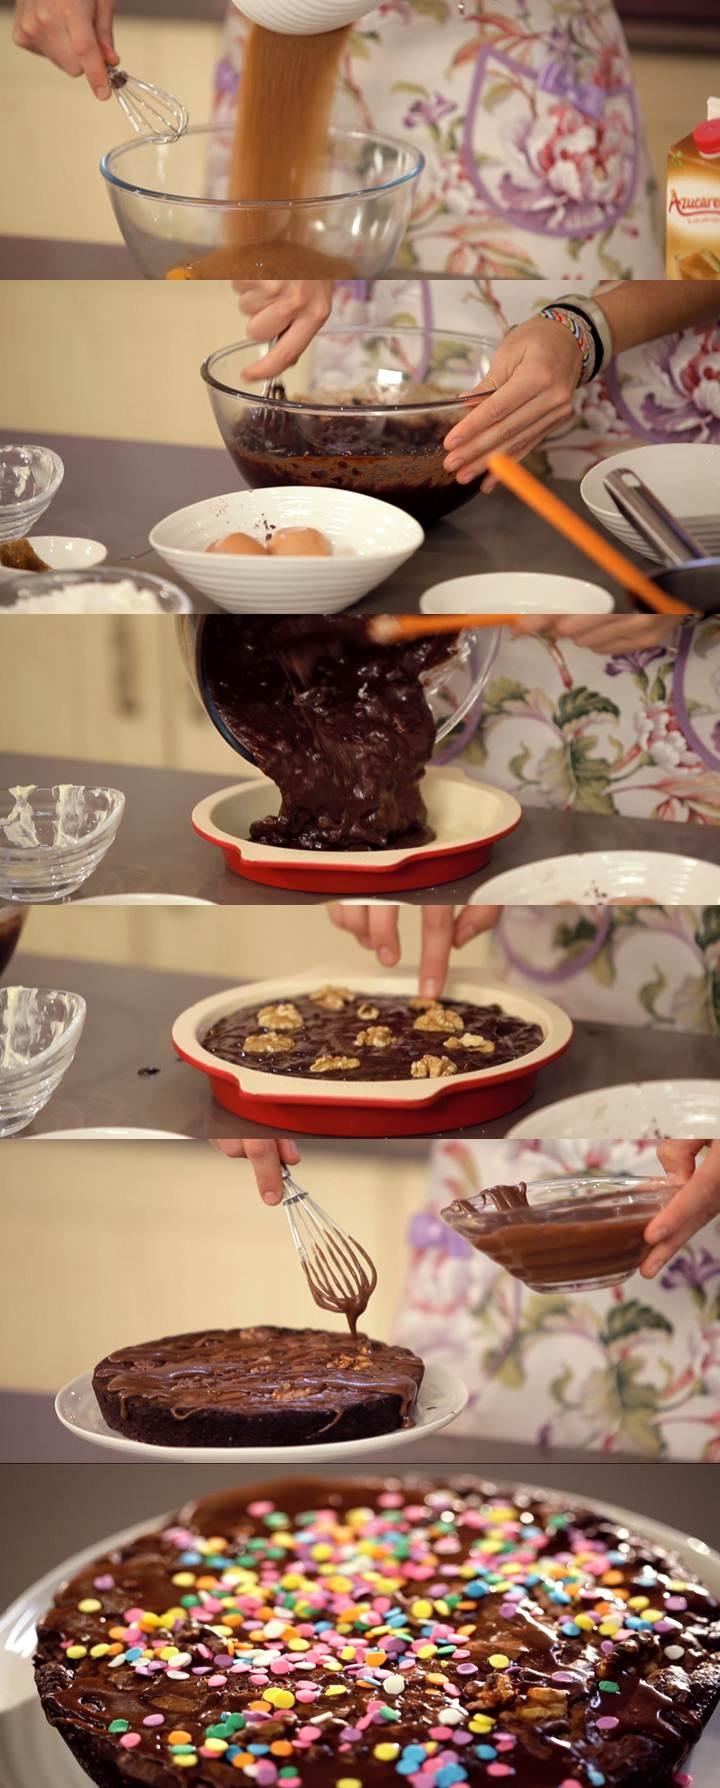 Programa 8 de Cupcake Maniacs: Brownie con glaseado de chocolate